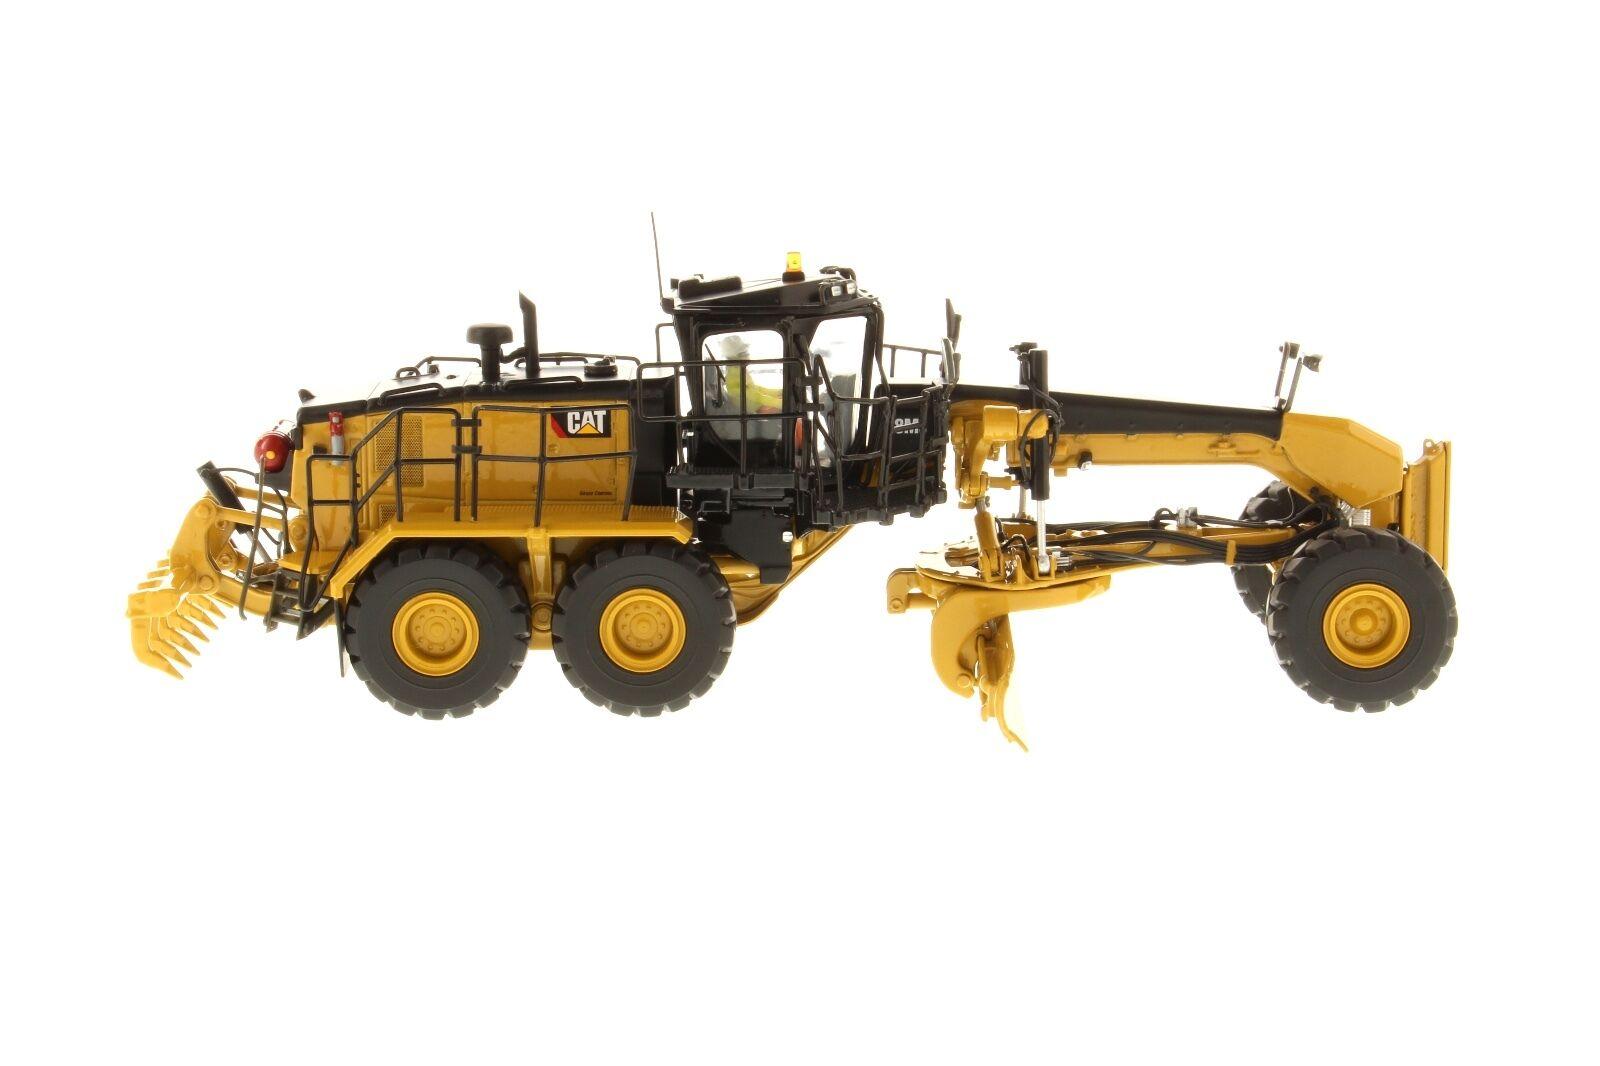 para barato Escala 1 50 Caterpillar Cat Cat Cat 18M3 Motor grado-Diecast Masters 85521  selección larga